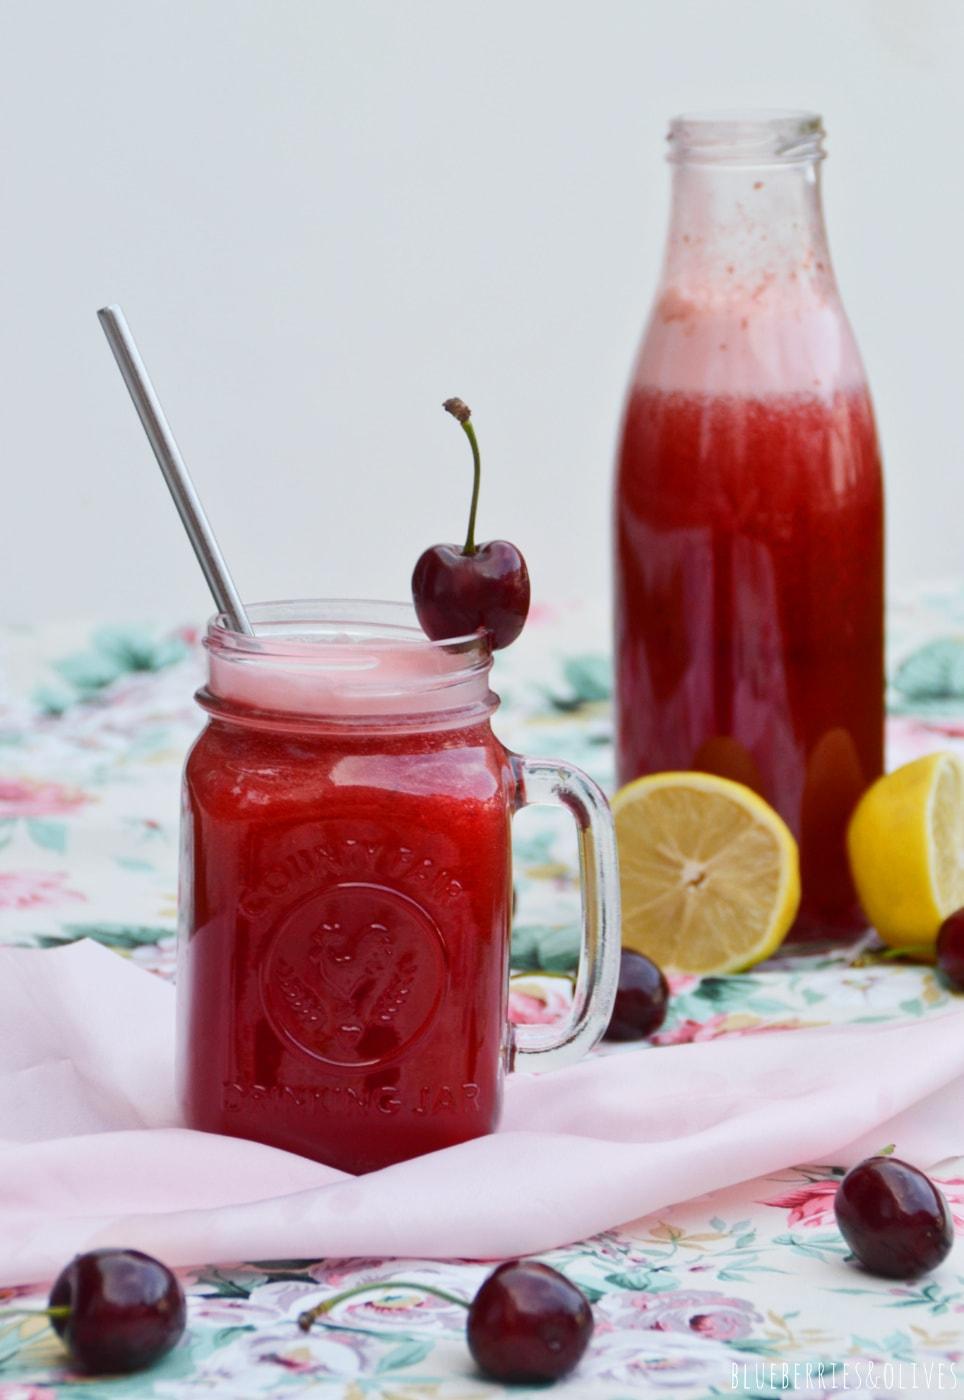 cherry lemonade in a glass jar, cristal bottle full, flowered table cloth, white background